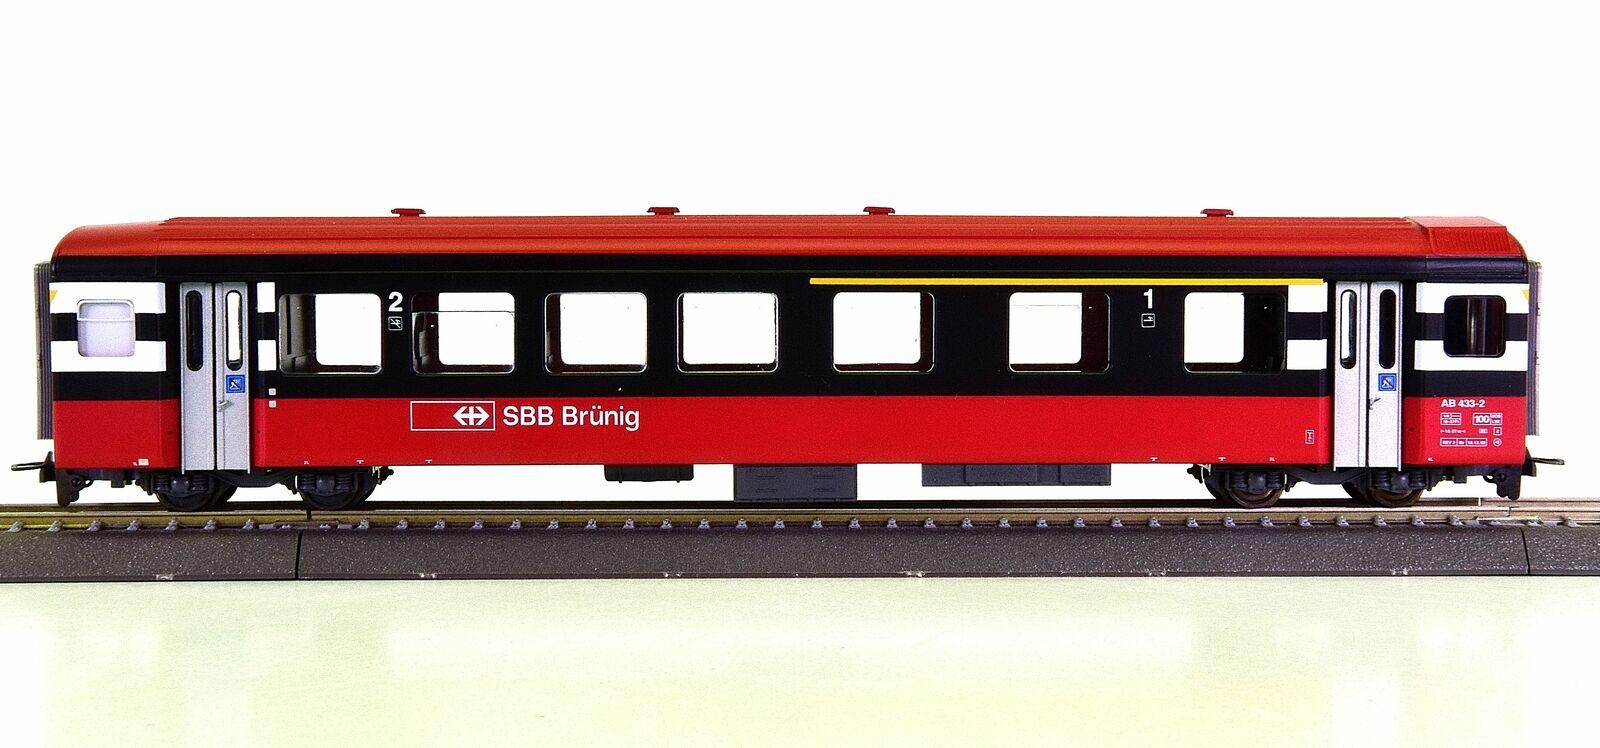 BEMO 3277 443 (h0m) - Vagoni 1. 2.kl. il SBB, Brünig PANORAMIC Express